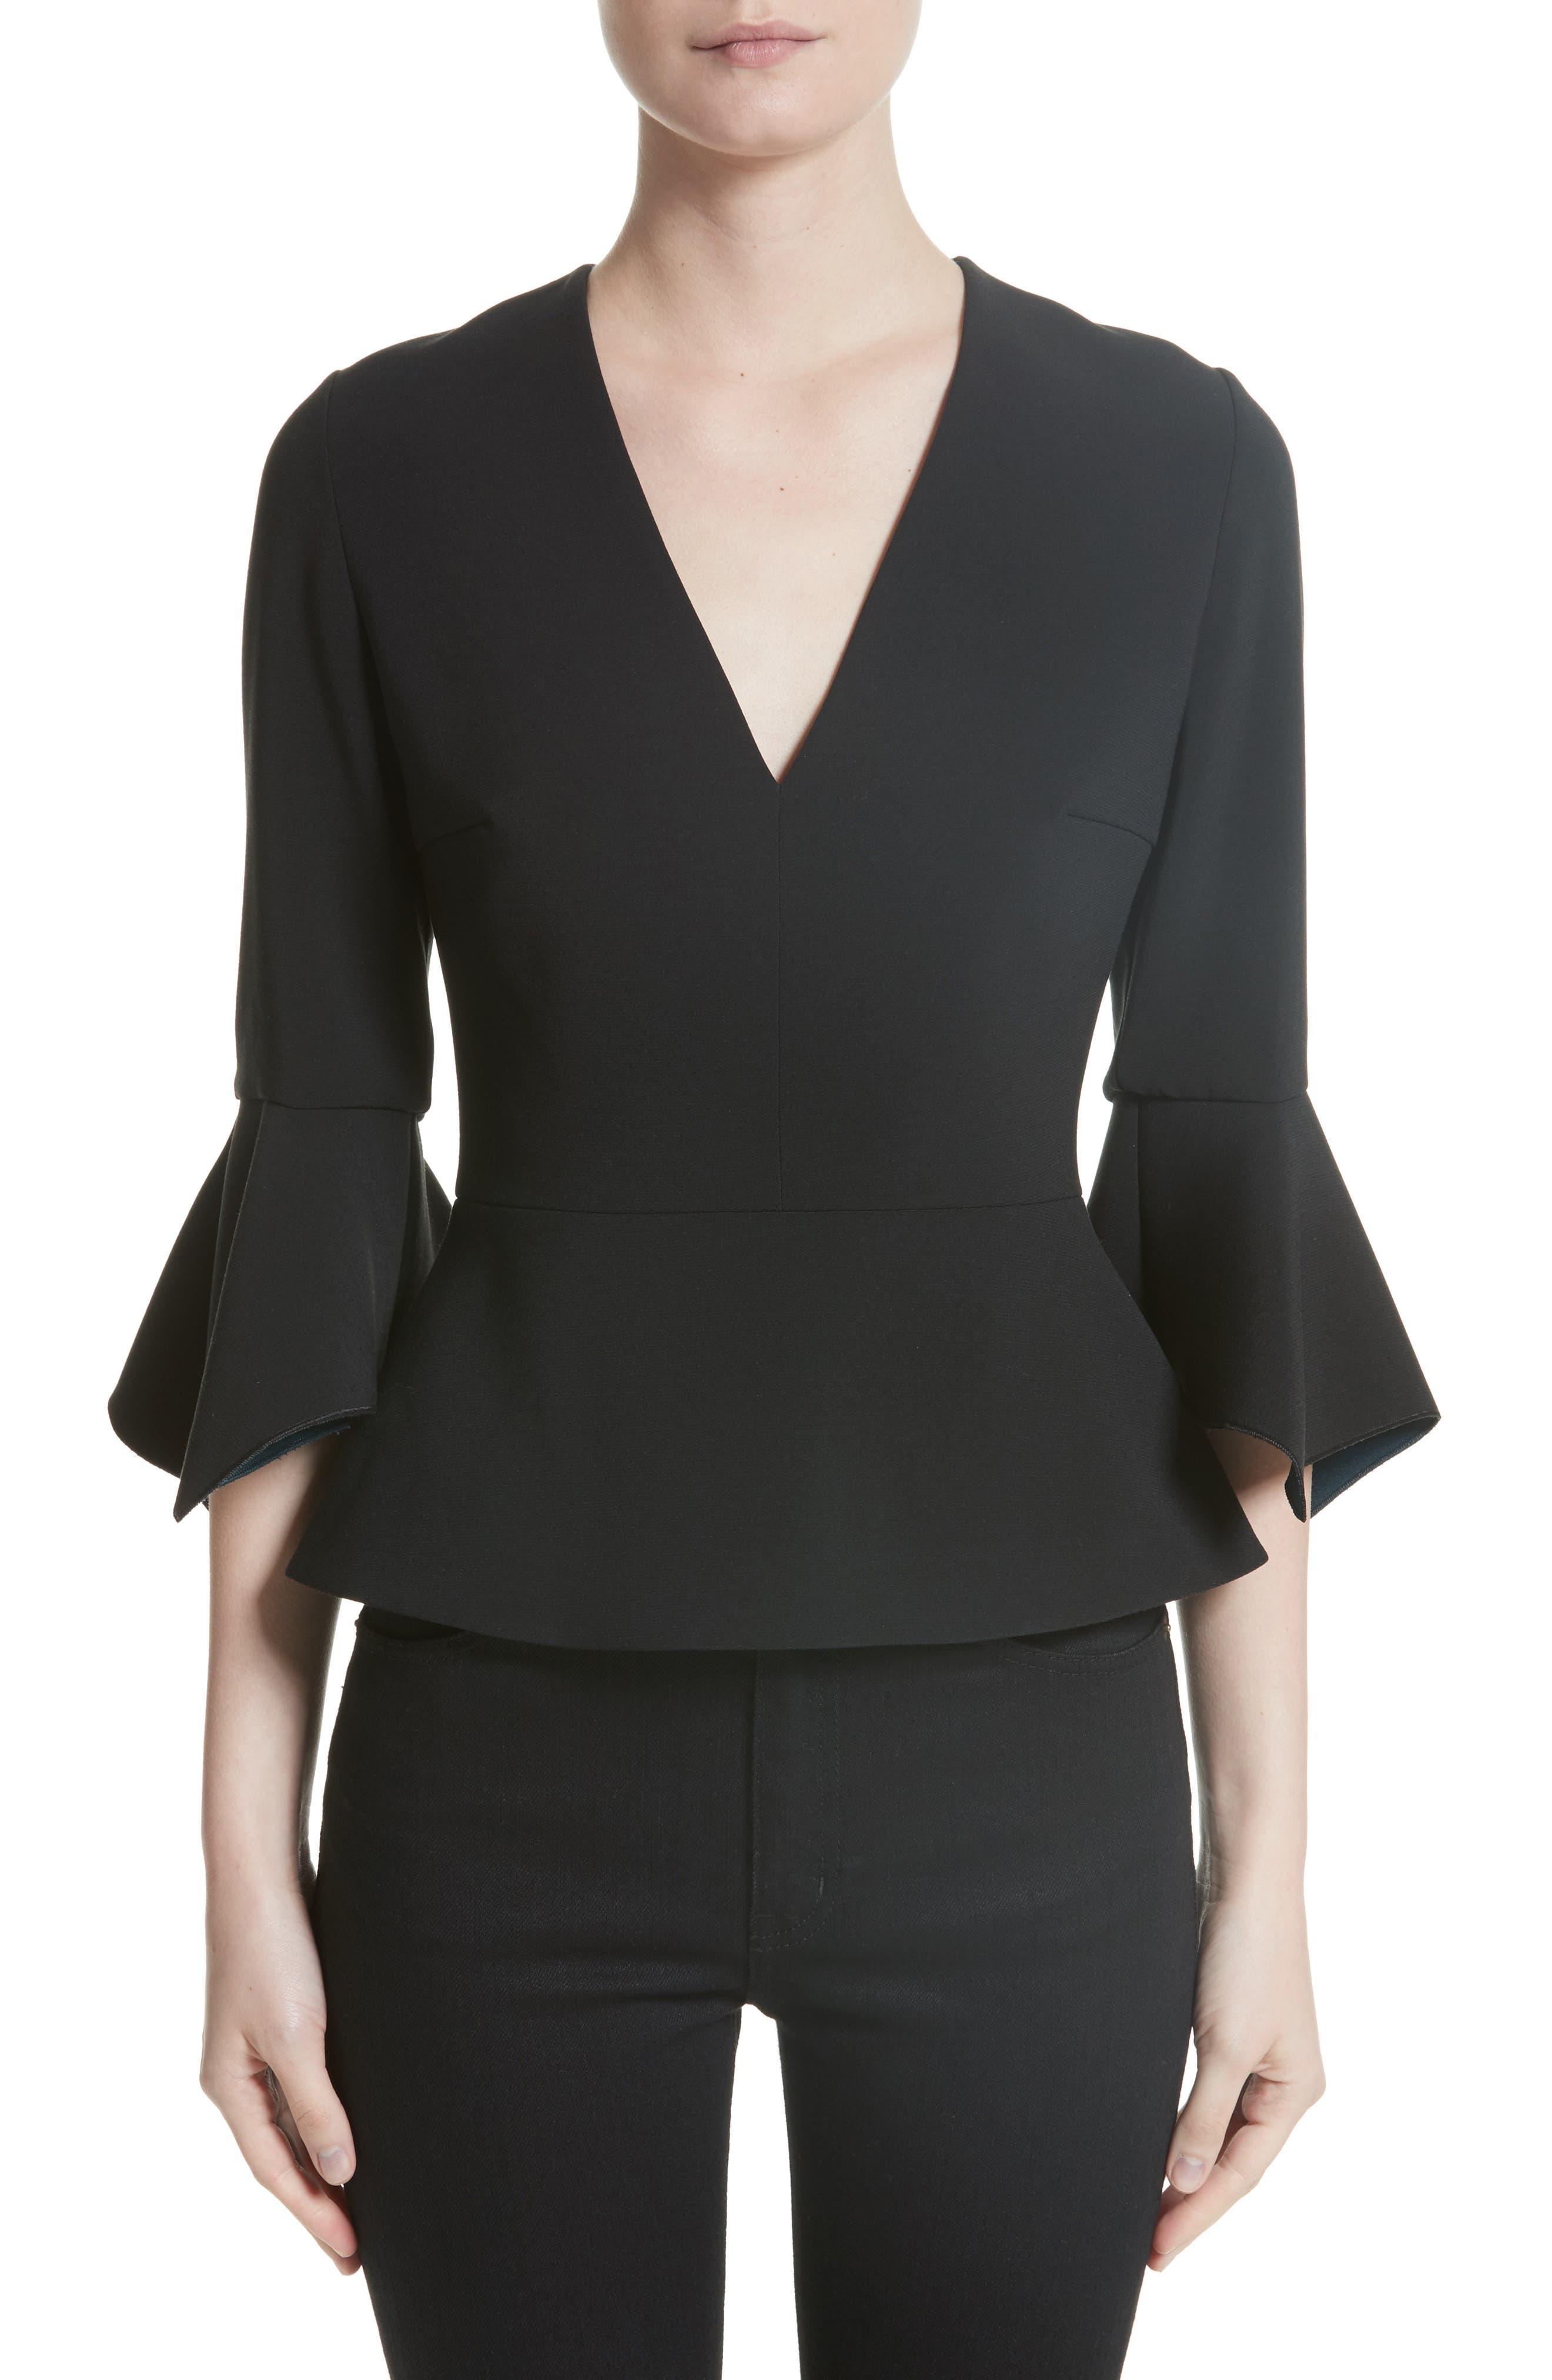 Prila Flare Sleeve Crepe Top,                         Main,                         color, Black/ Peacock